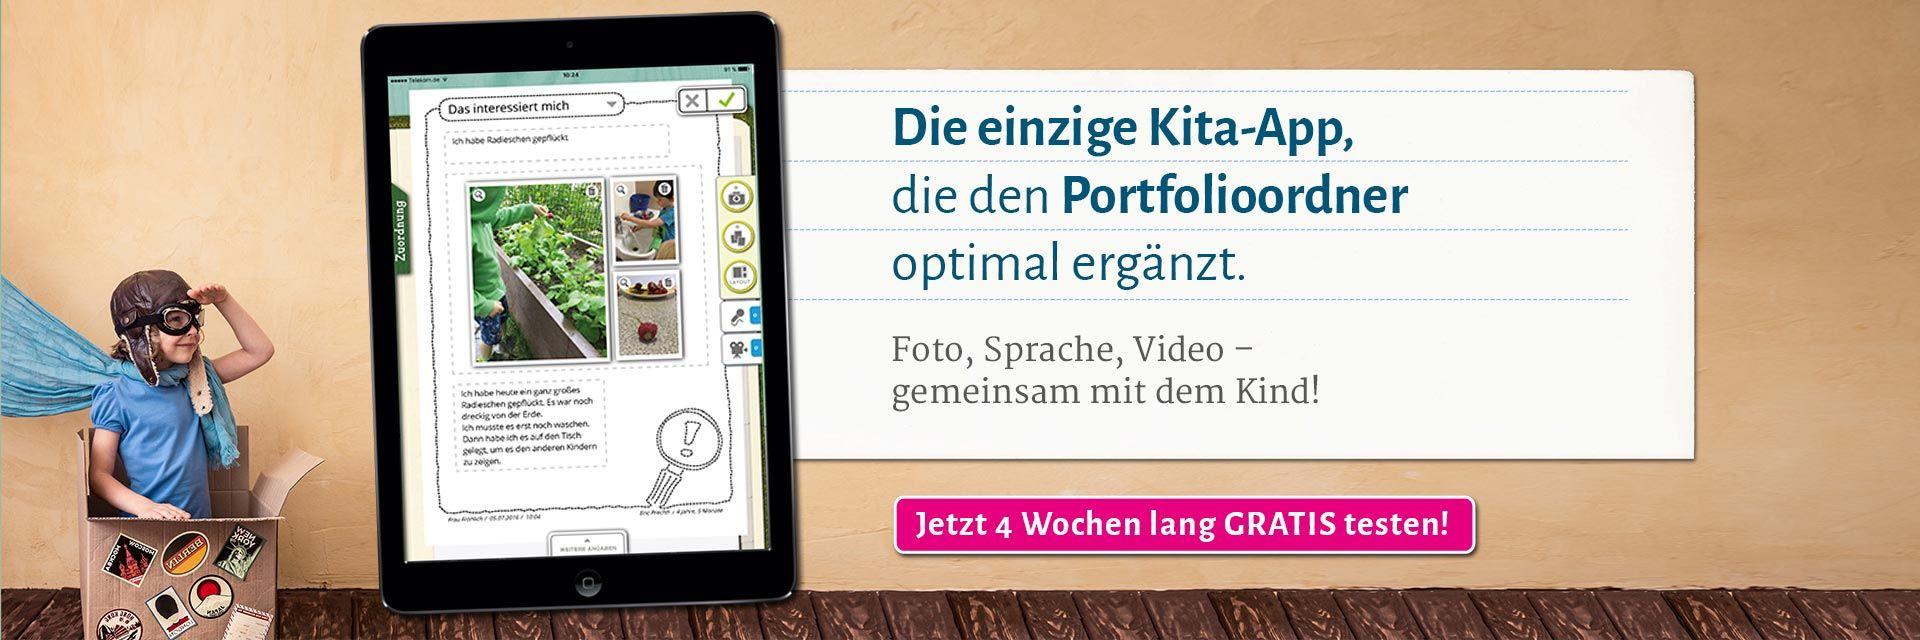 Pin von Kitalino auf Die KitaApp stepfolio Ordner, App